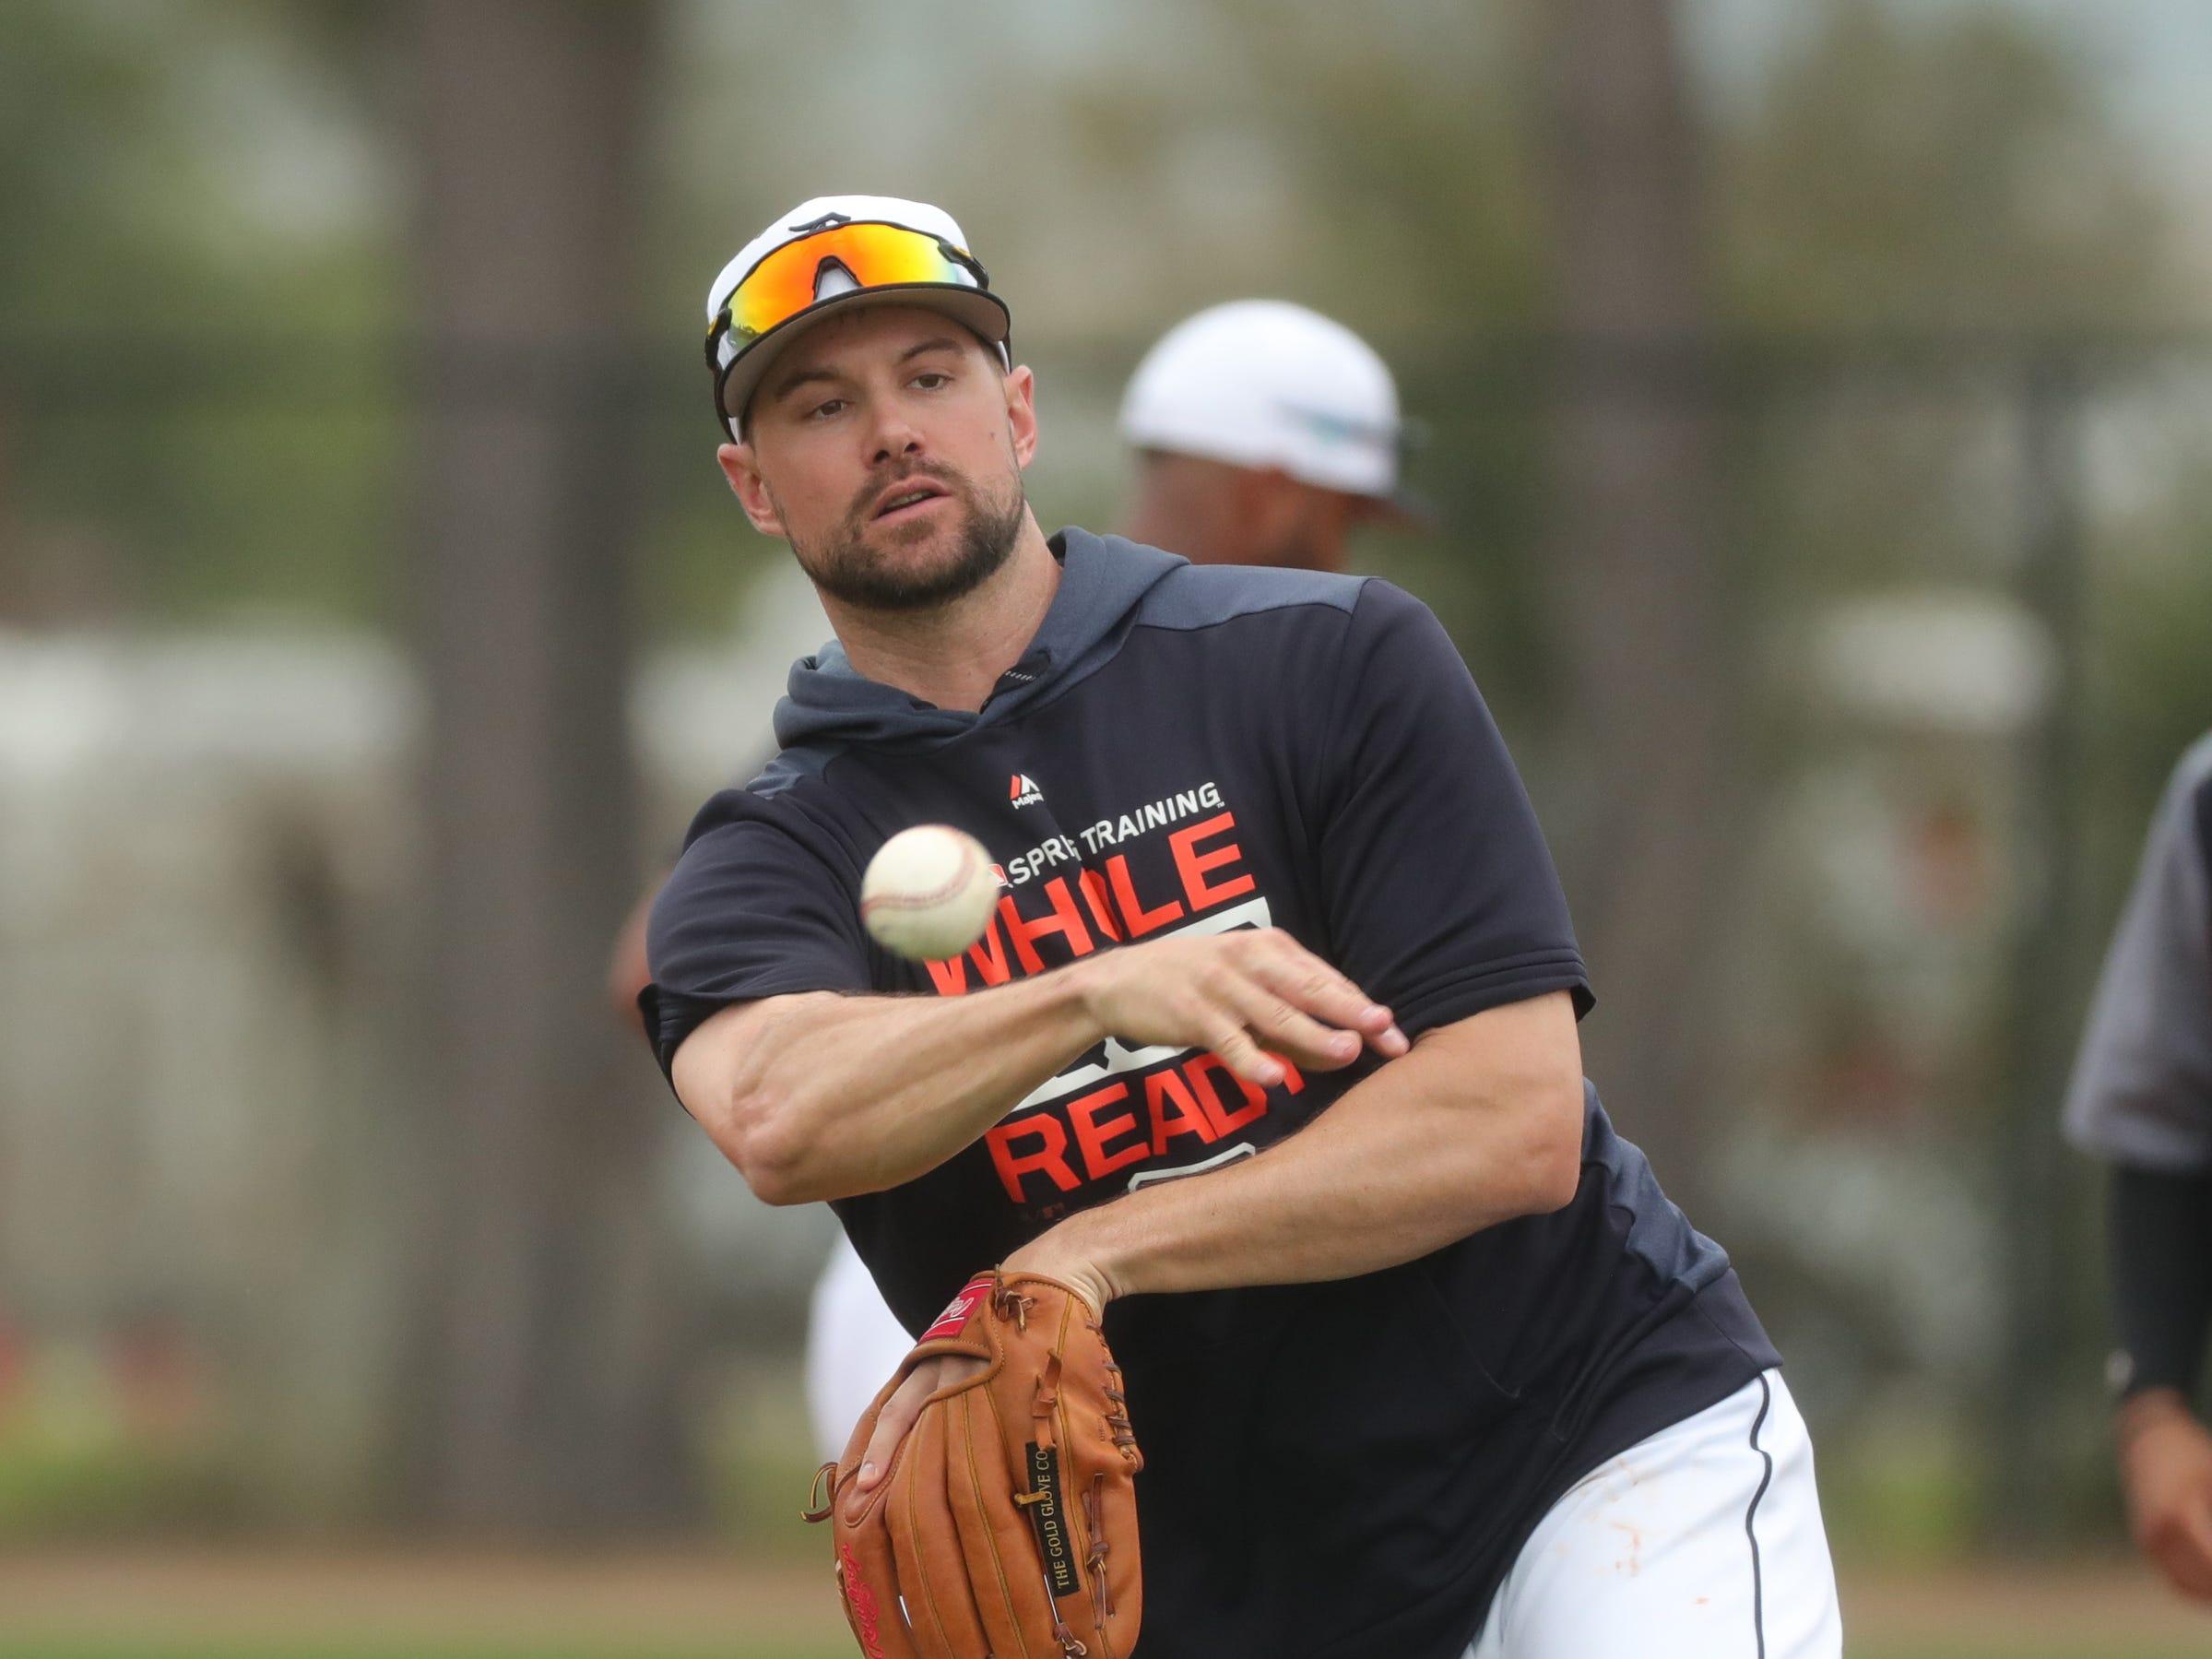 Detroit Tigers infielder Jordy Mercer at shortstop during practice Monday, Feb. 18, 2019 at Publix Field at Joker Marchant Stadium in Lakeland, Fla.